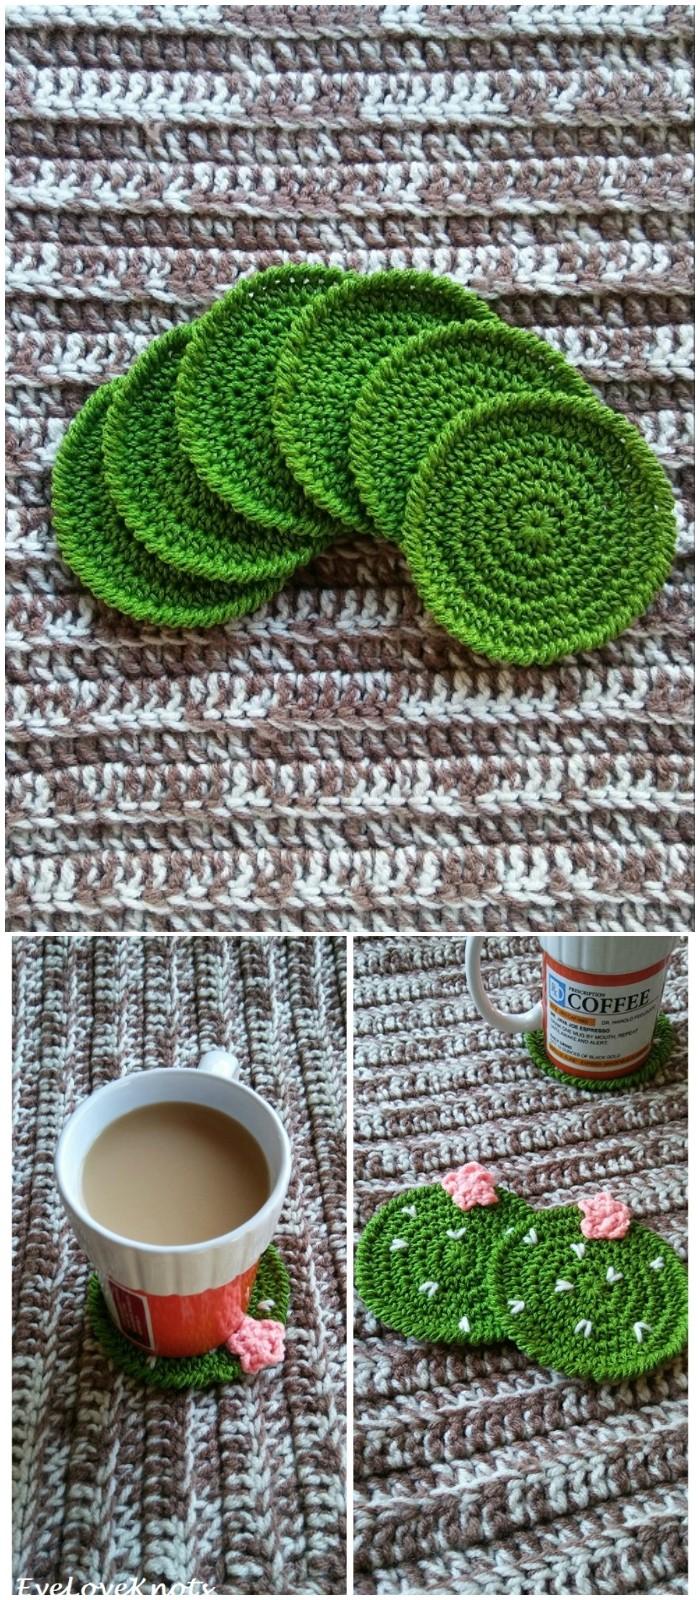 Cactus Crochet Coasters